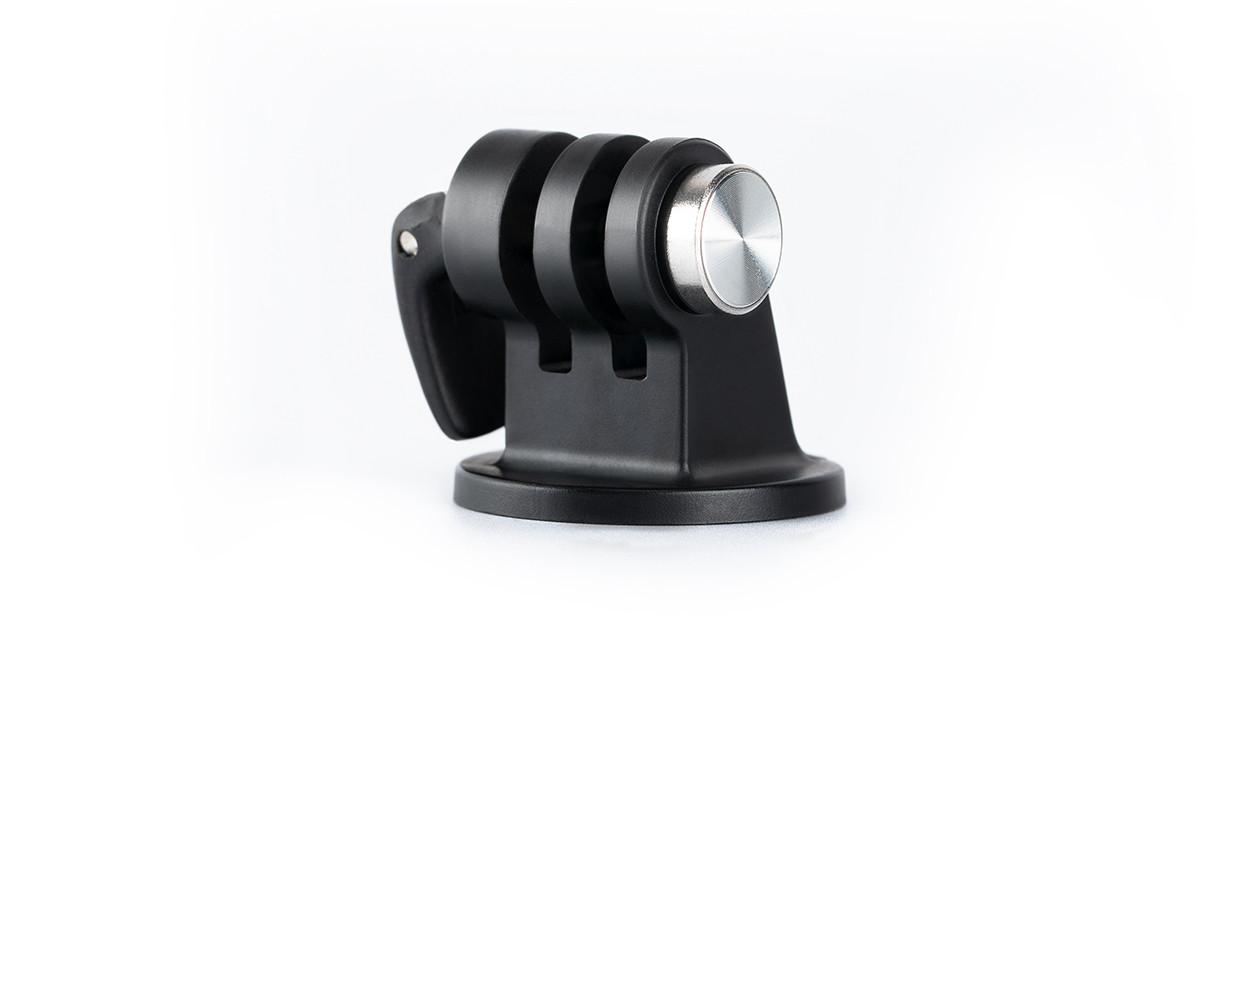 OSMO-POCKET-运动相机四分之一接口转接座-英文版_02.jpg